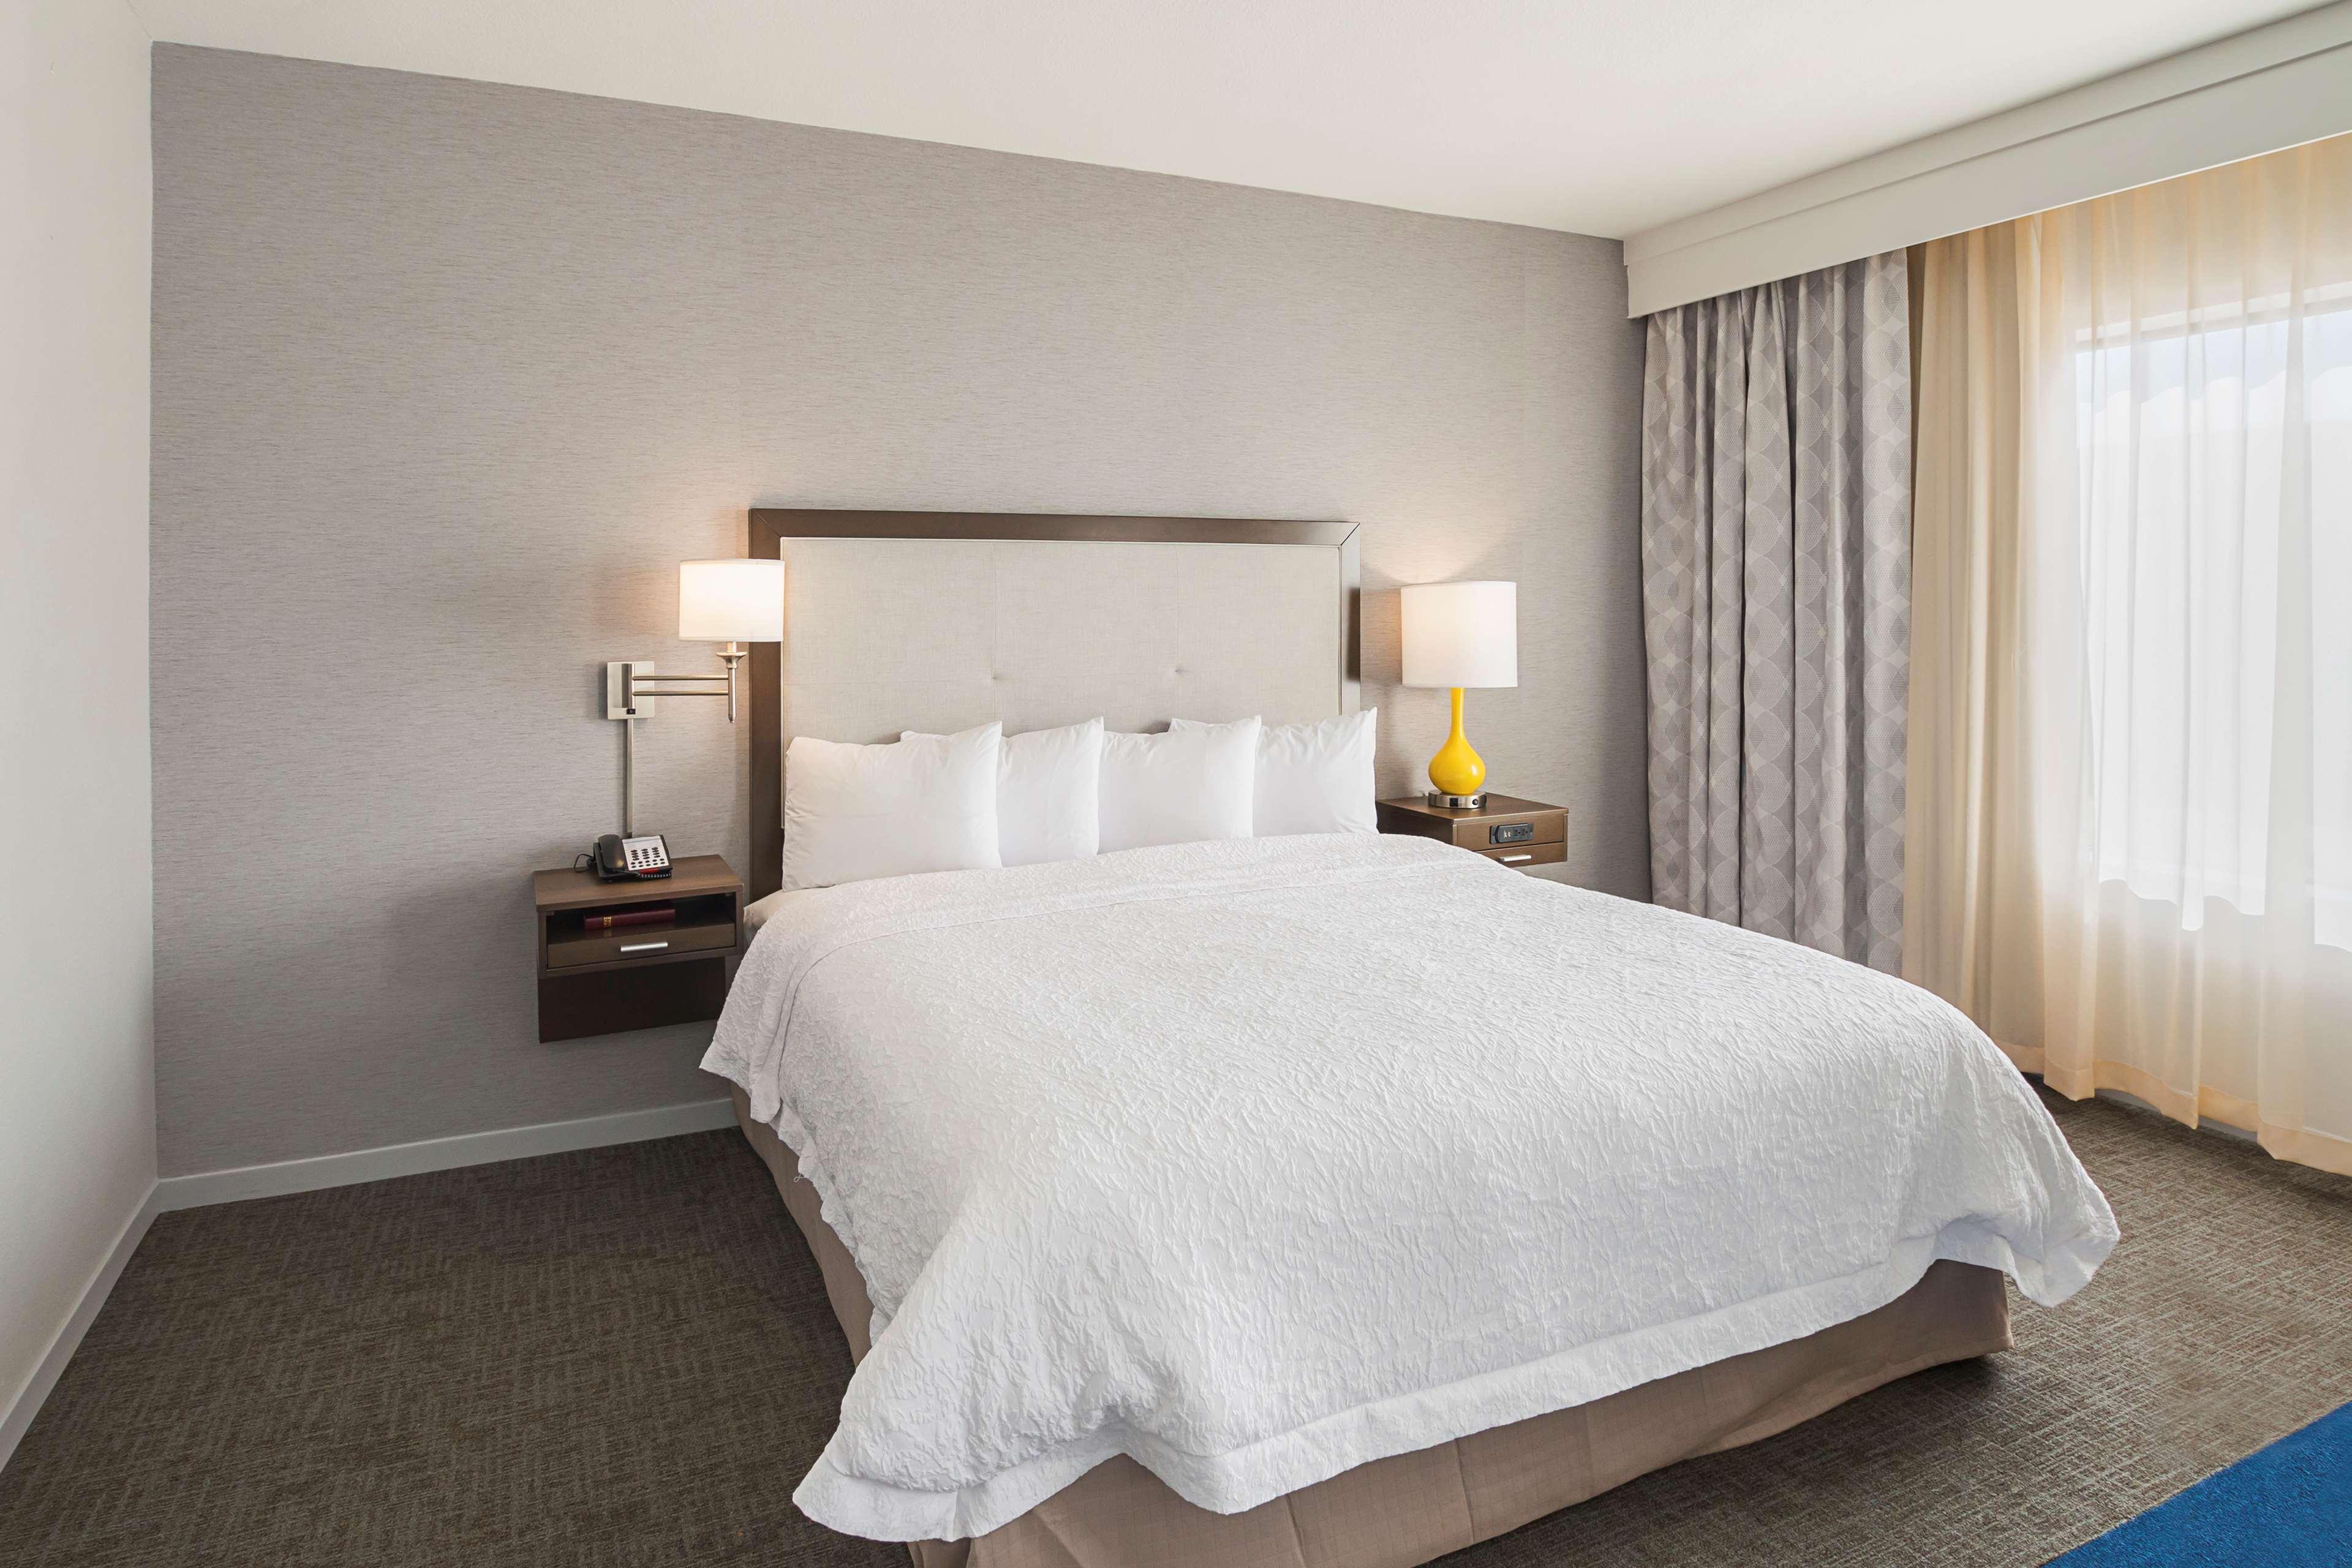 Hampton Inn & Suites Colleyville DFW West image 35